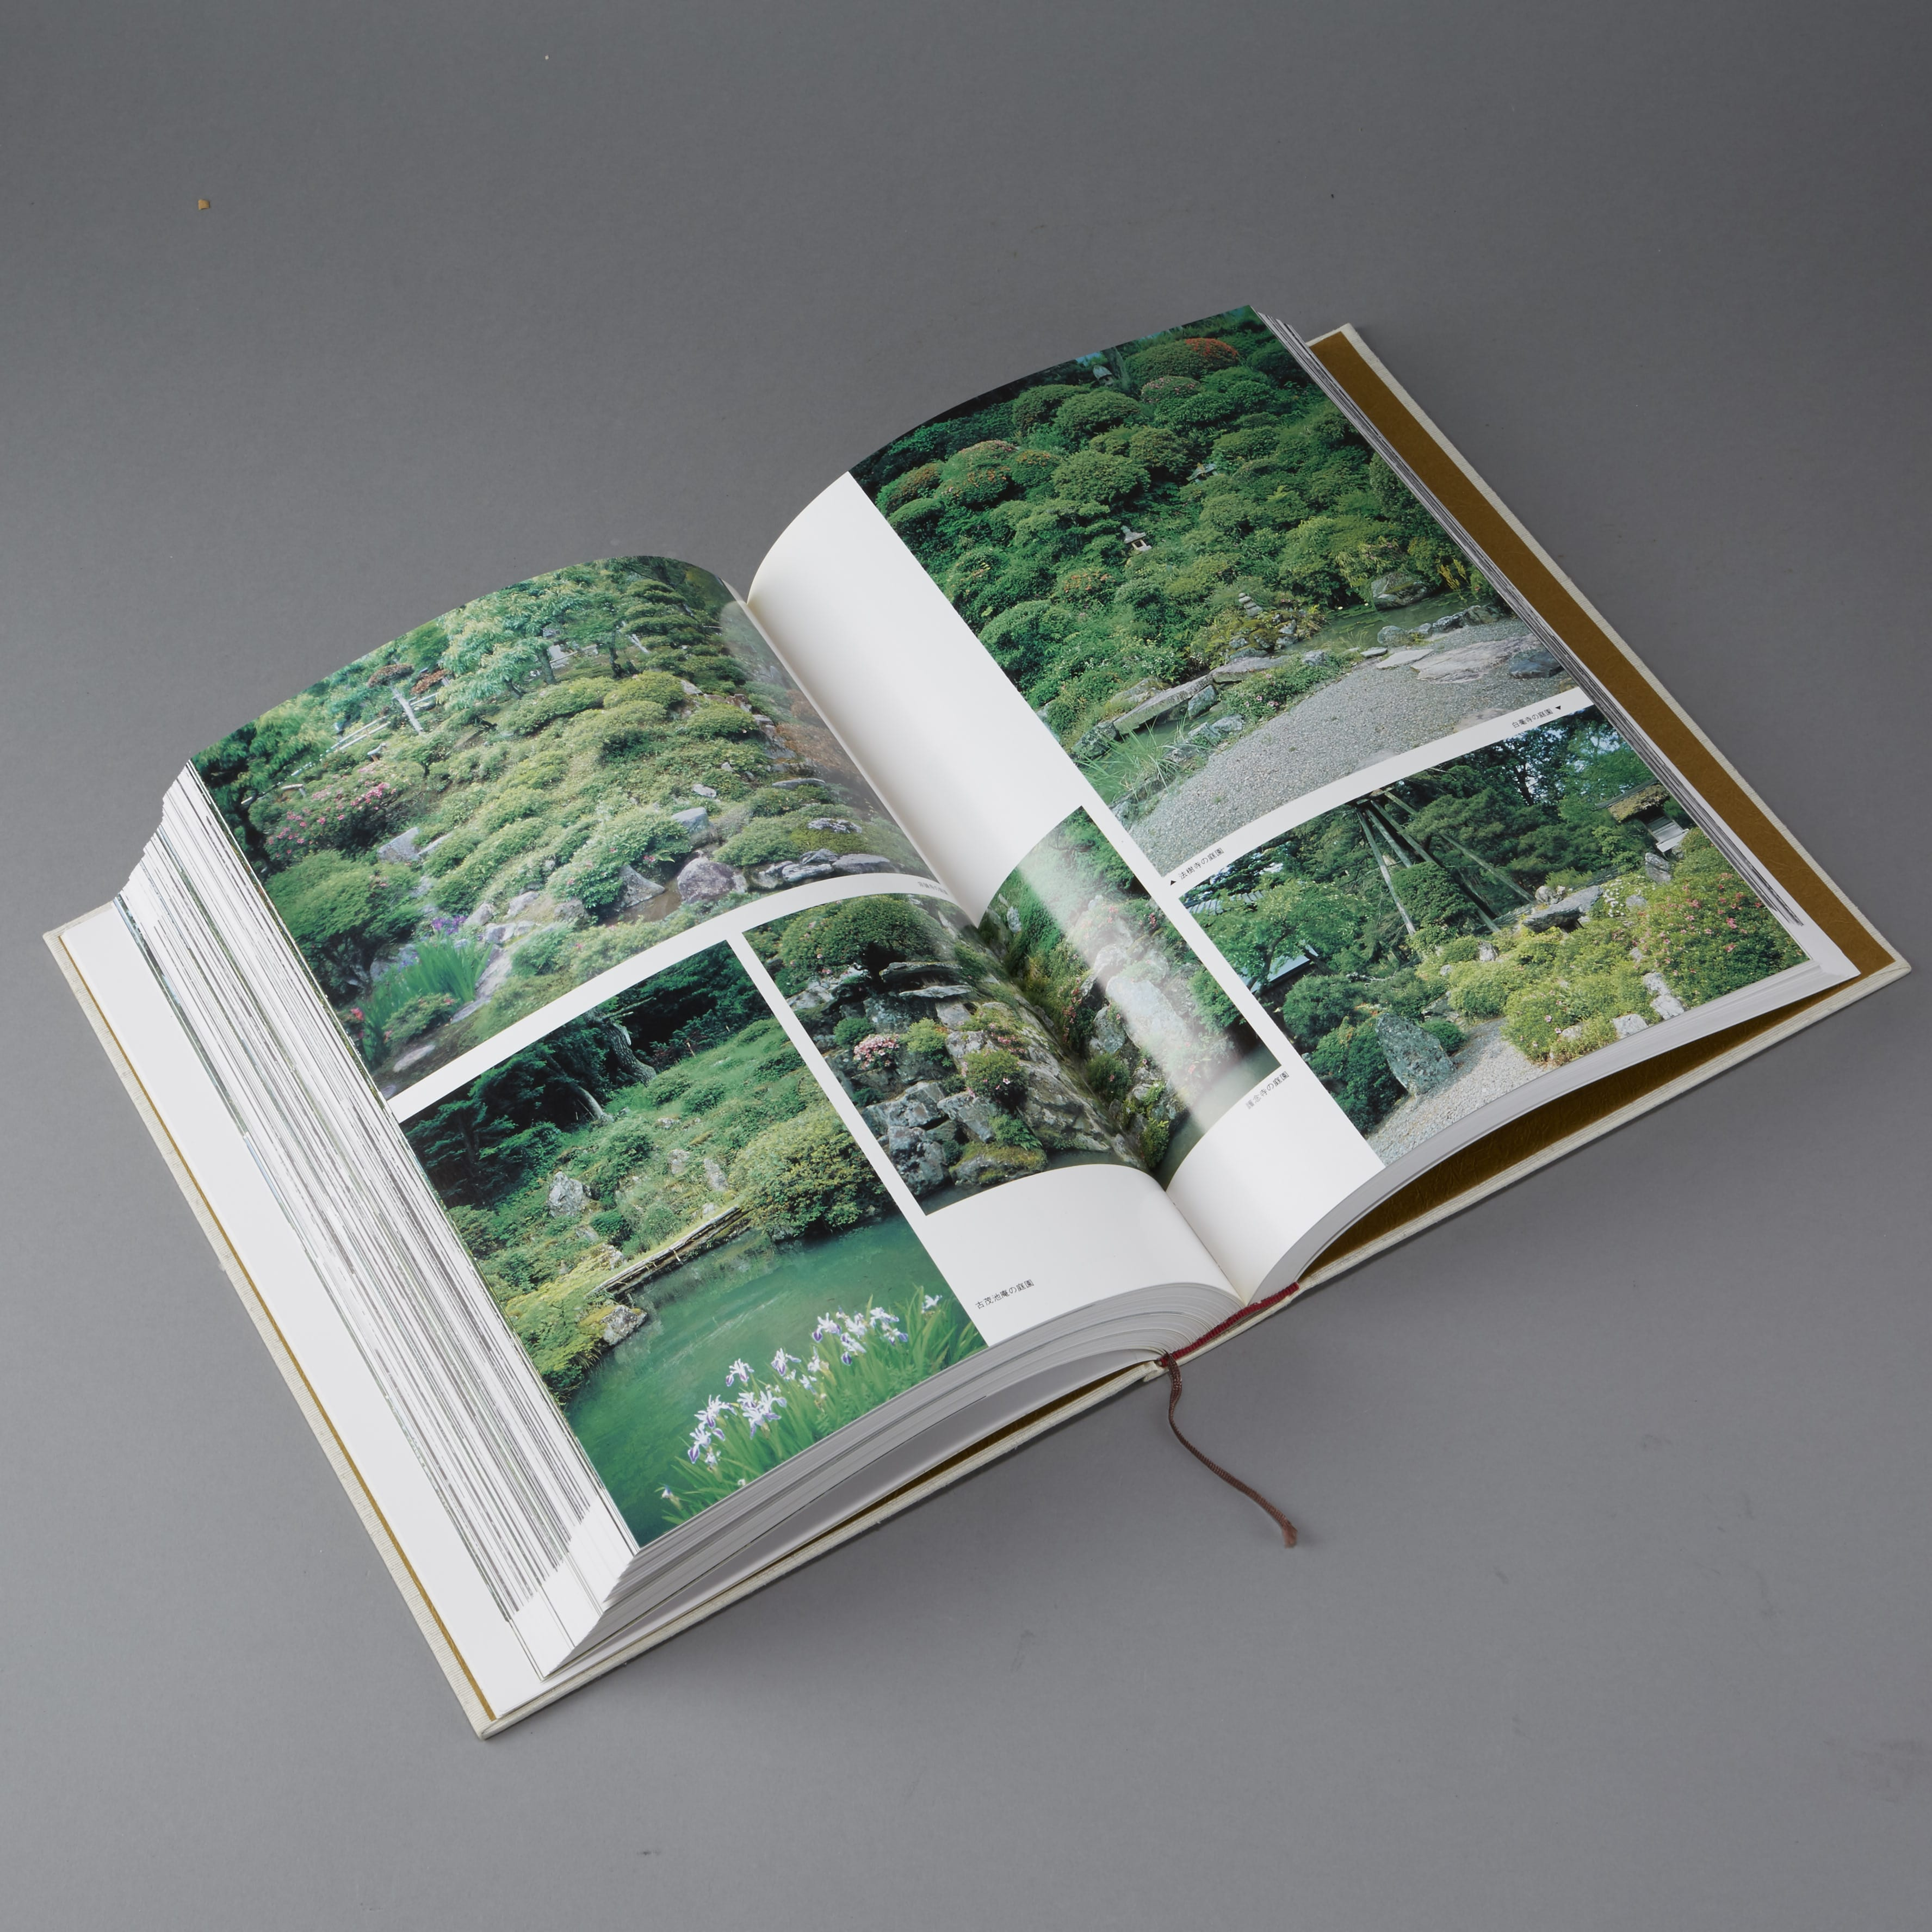 Lot 277: Pair of Rare Japanese Gardening books Nihon No Furui Teien Old Japanese Gardens